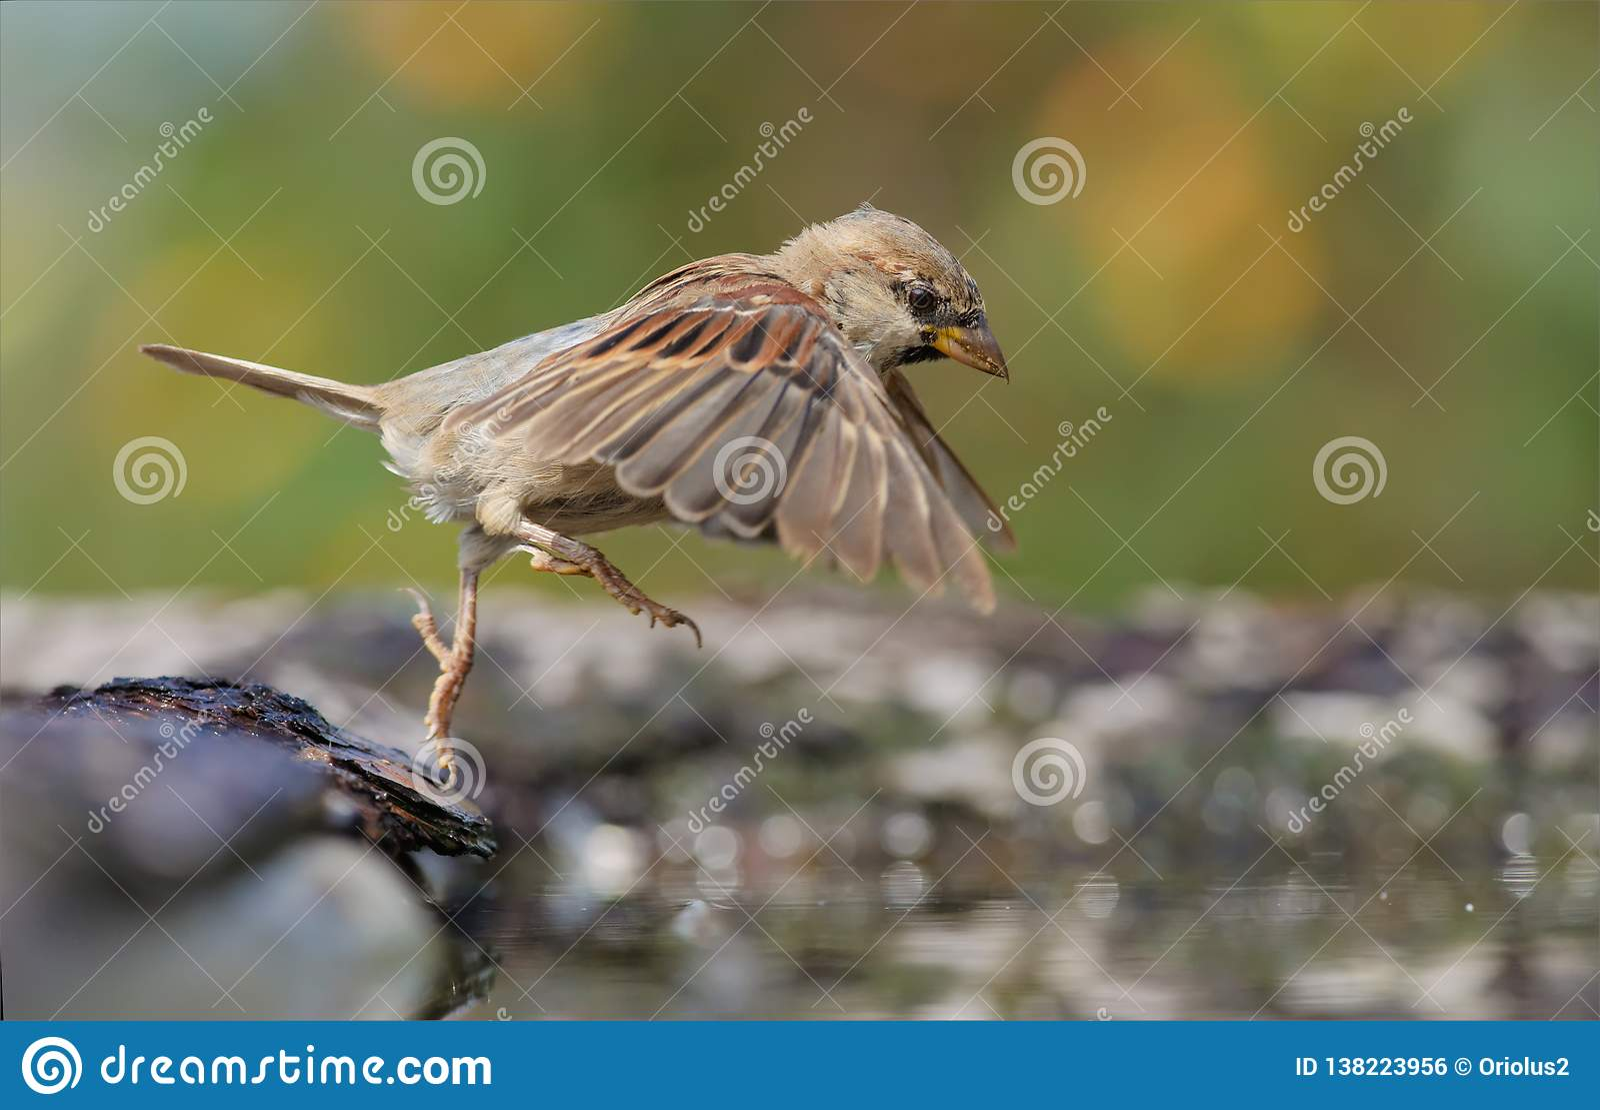 Pardal de casa que salta na lagoa de água com asas e pés esticados